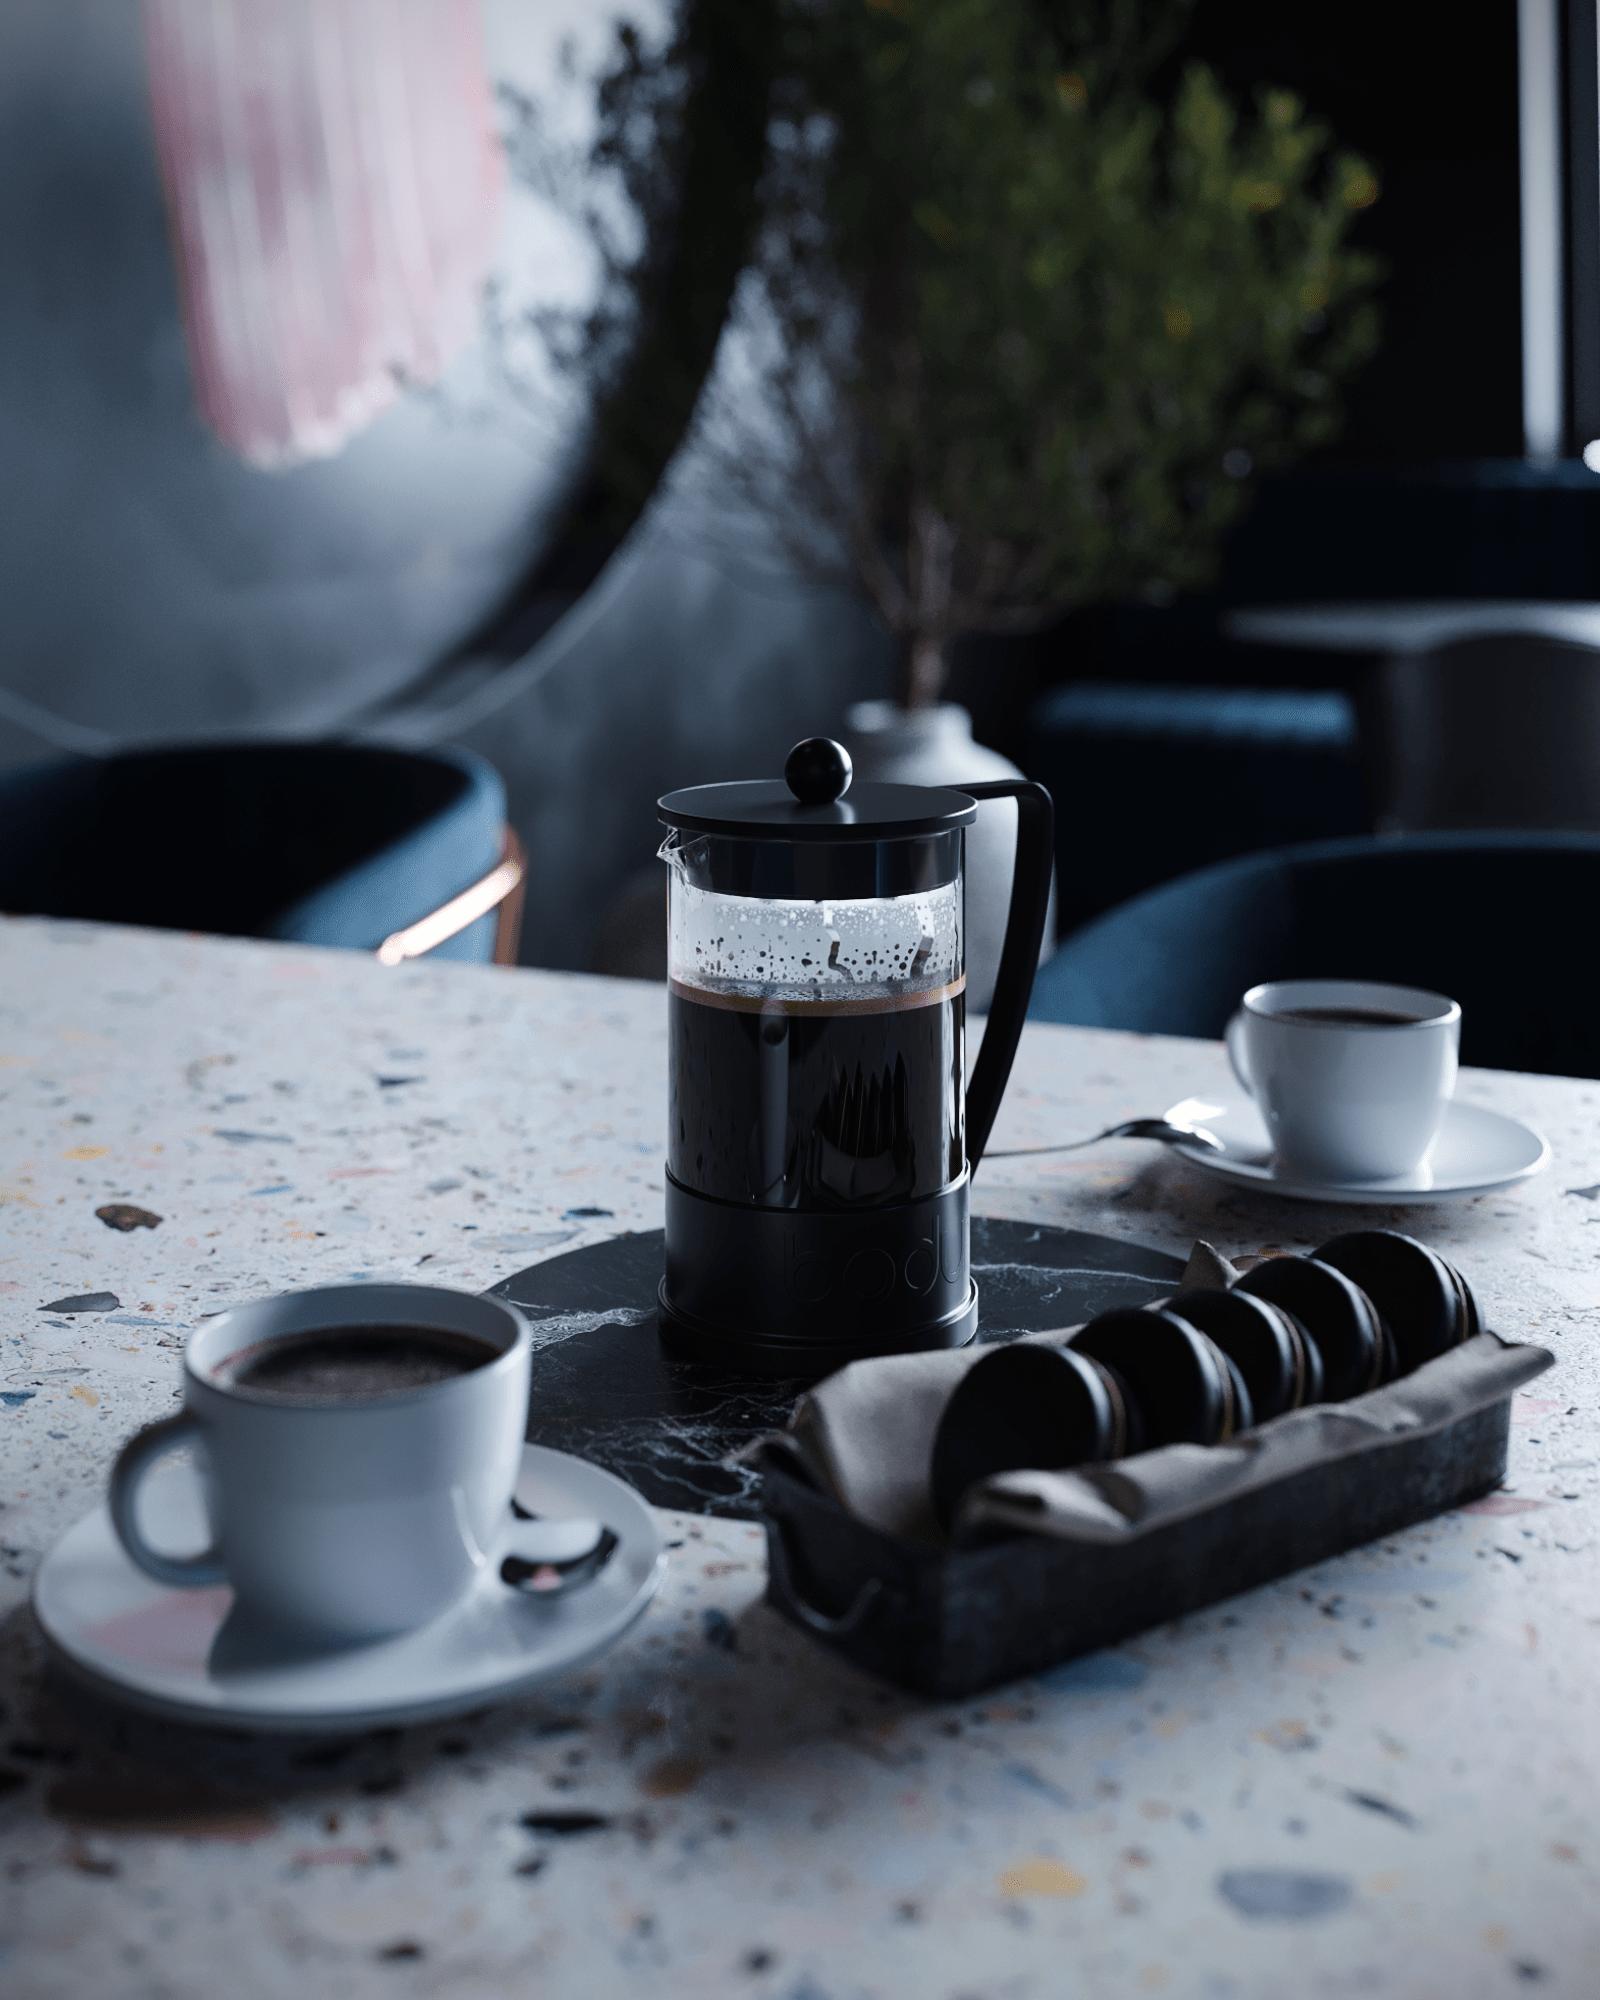 https://studioautograph.com/wp-content/uploads/2021/02/studio-autograph-ltd-berlin-design-cafe13-min.png